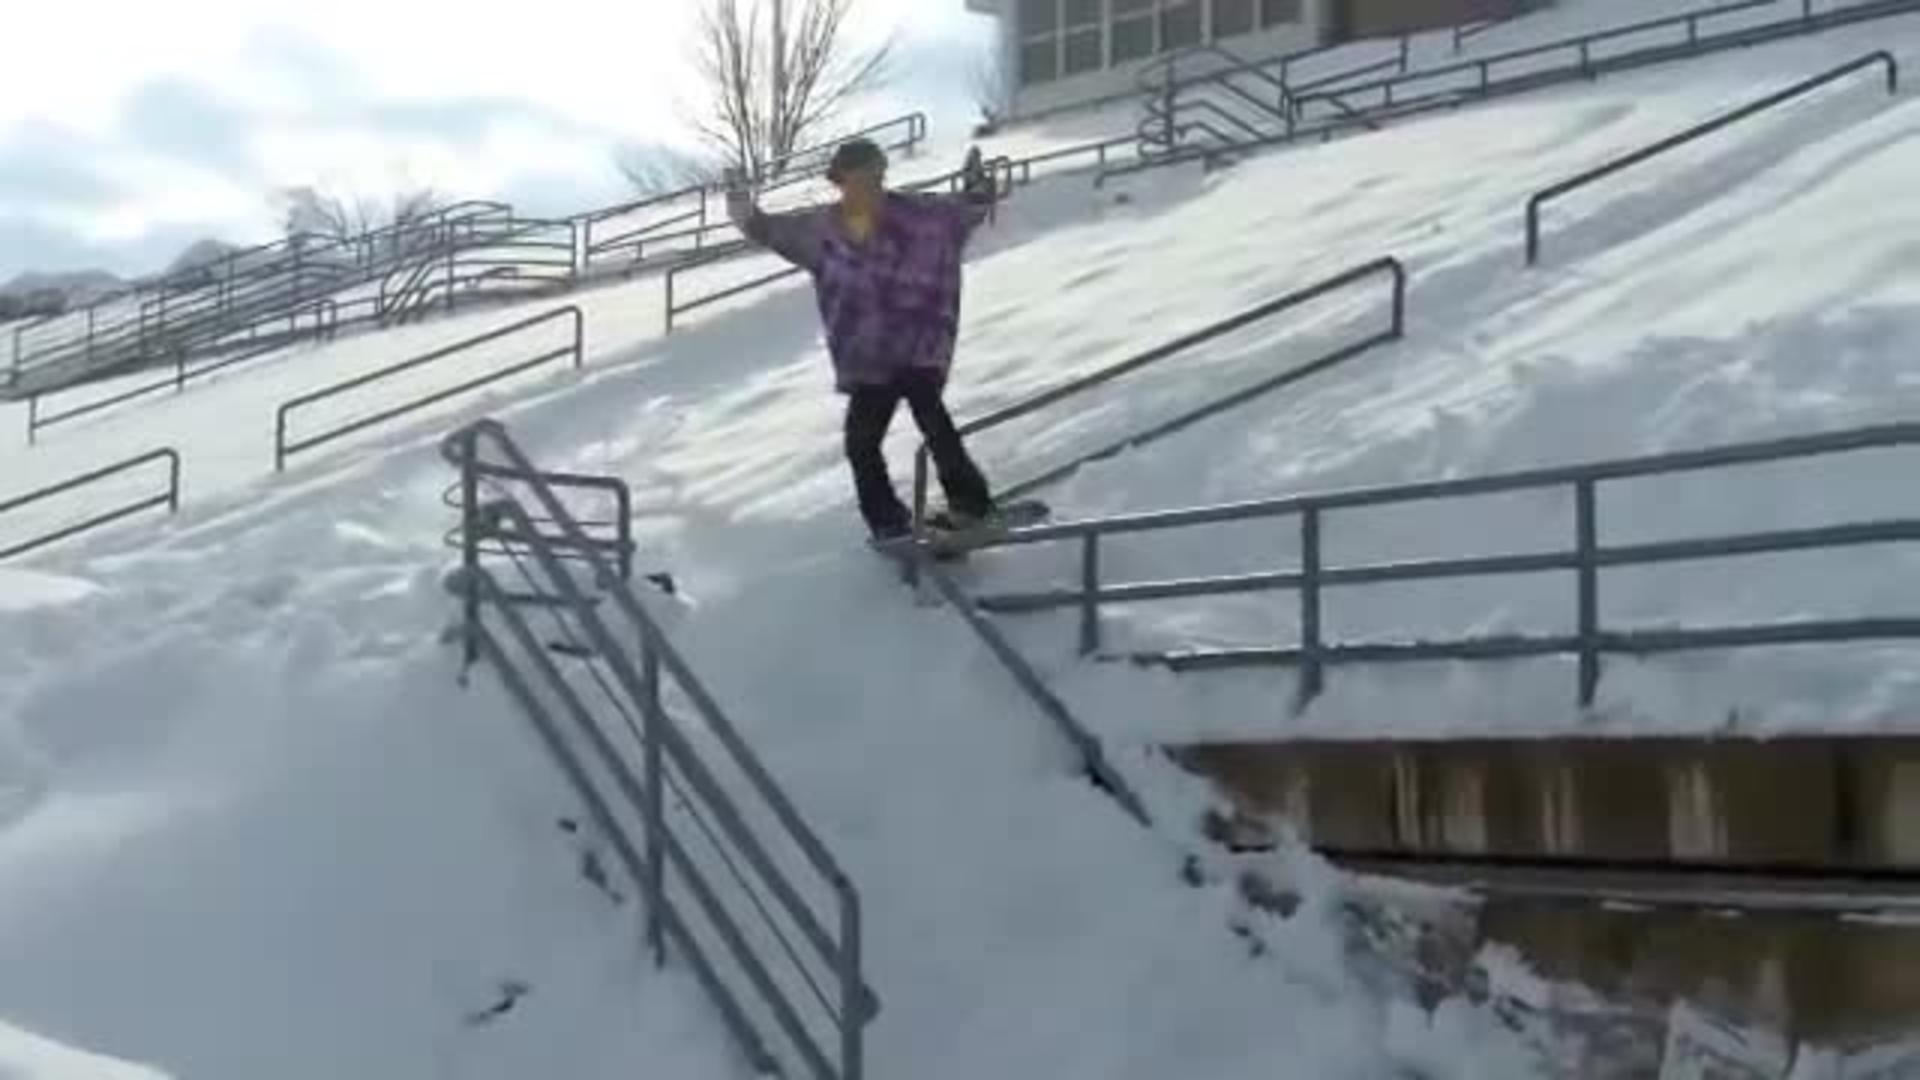 snowboarding rail slide awkward fall jukin media